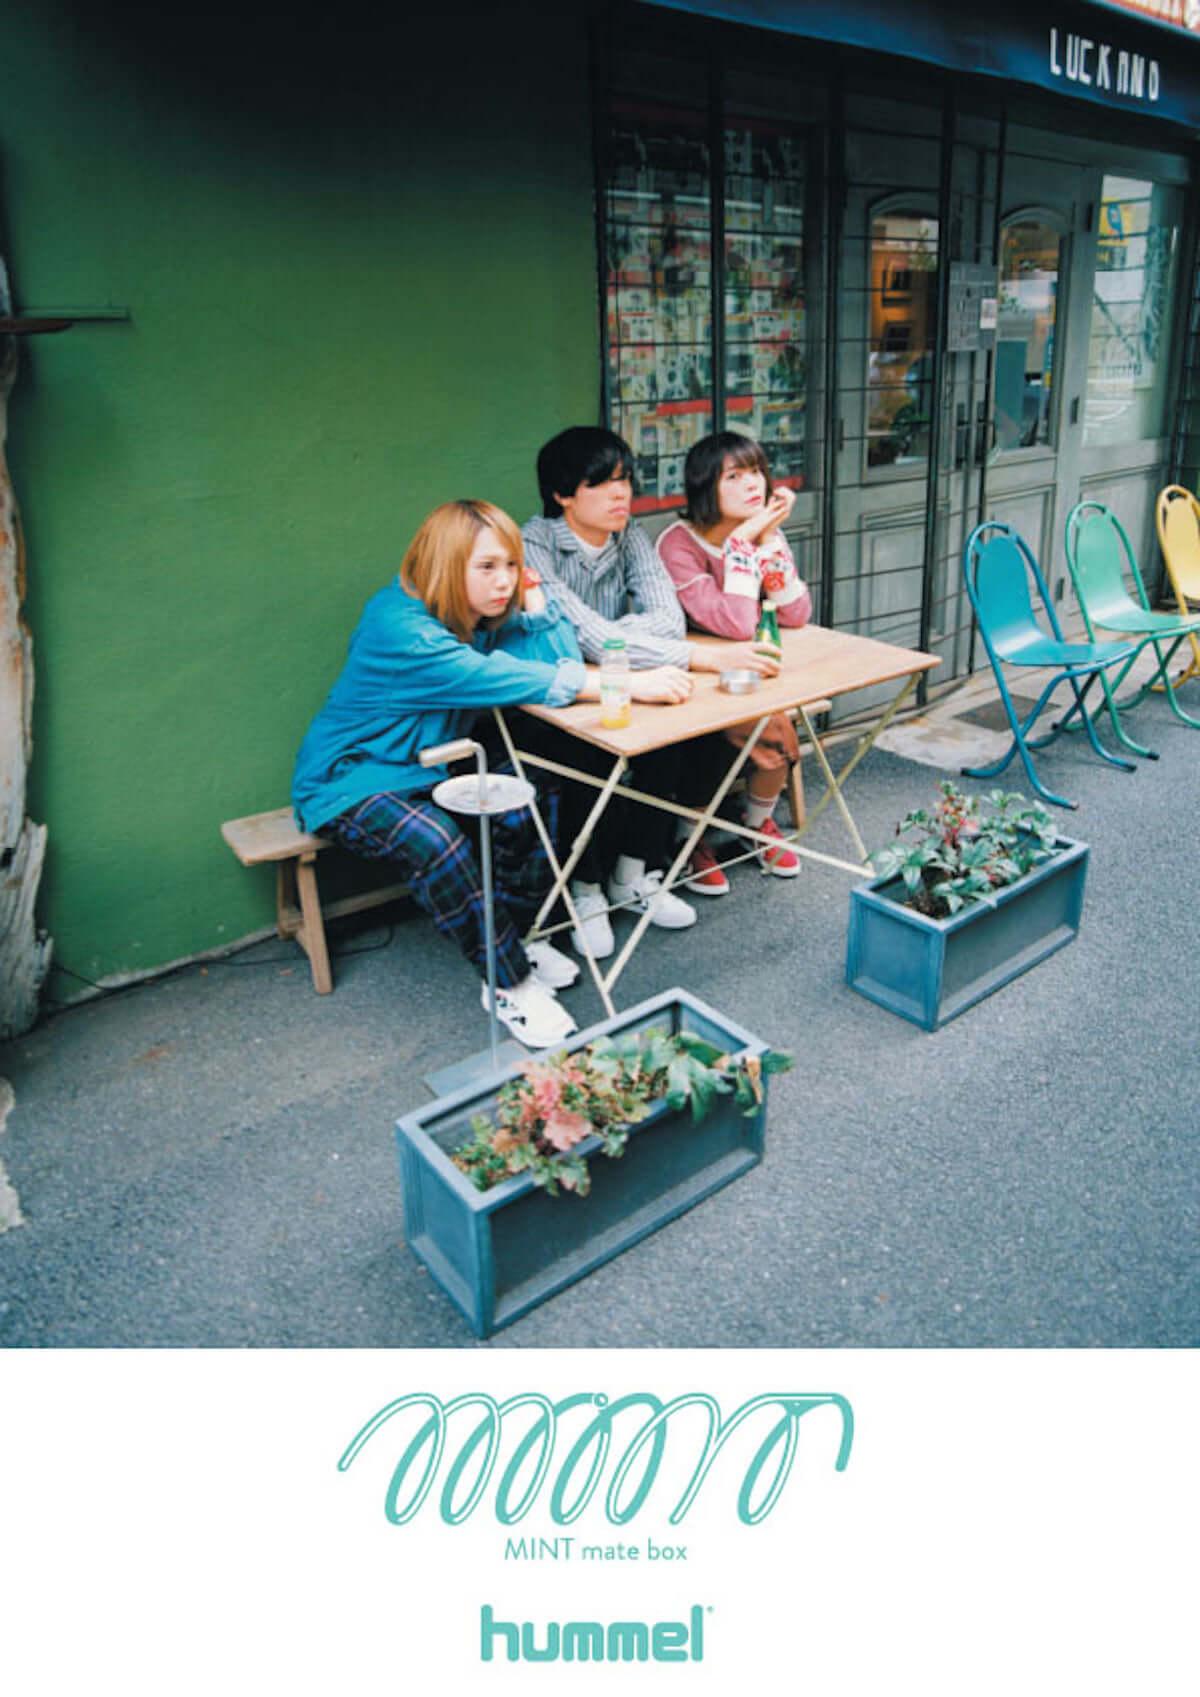 hummelとMINT mate boxによるコラボで店舗キャンペーンが実施中! music181012-hummellovesmusic-11-1200x1697